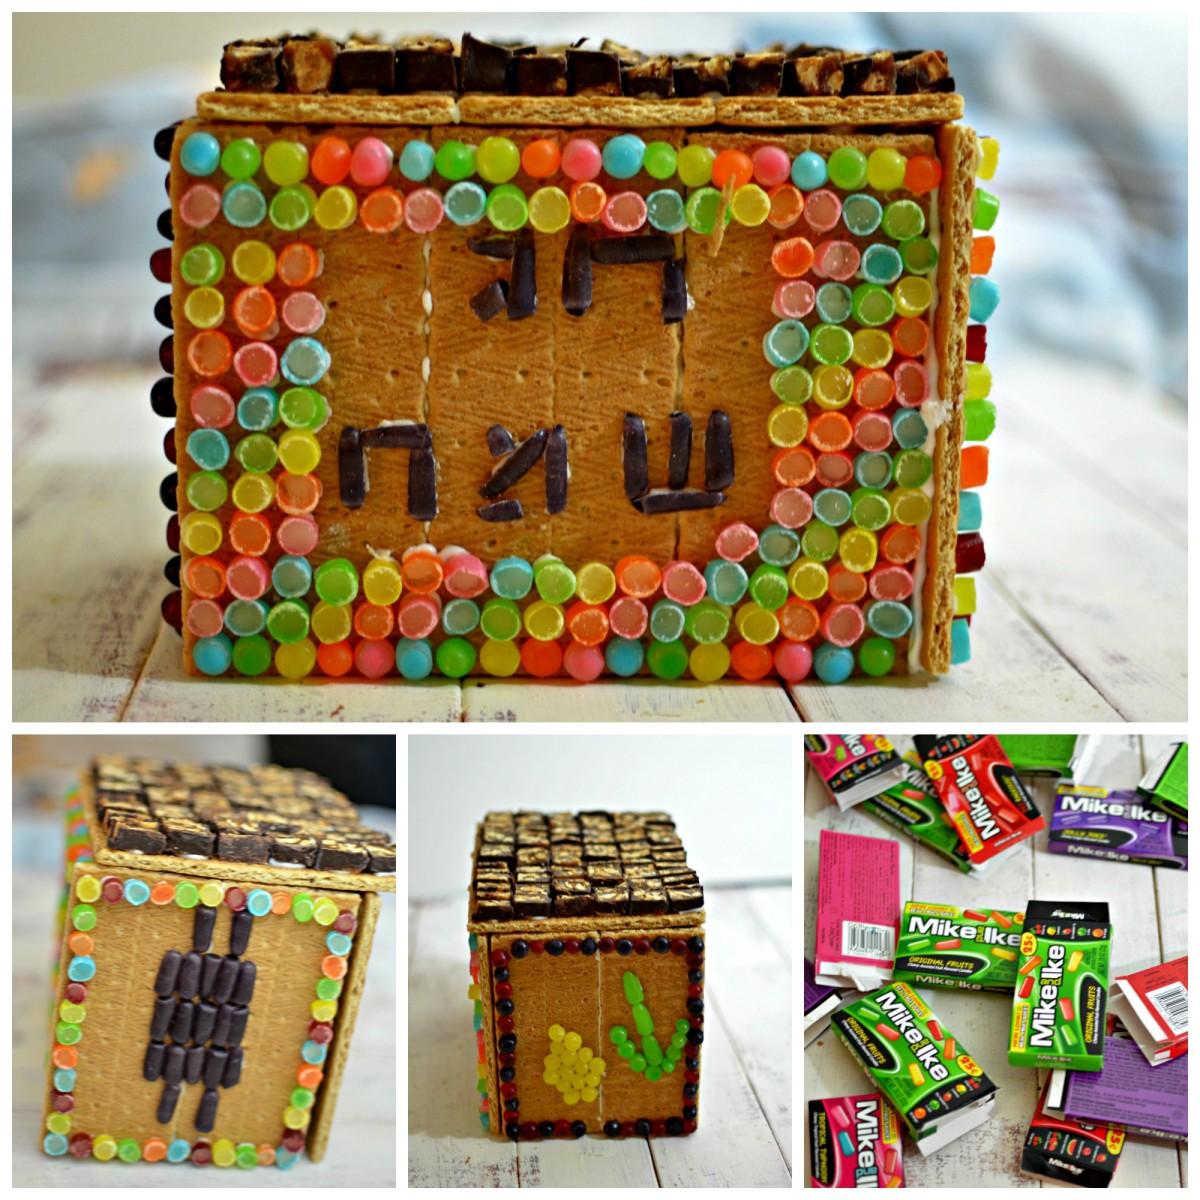 Candy Sukkah_Miriam Szokovski